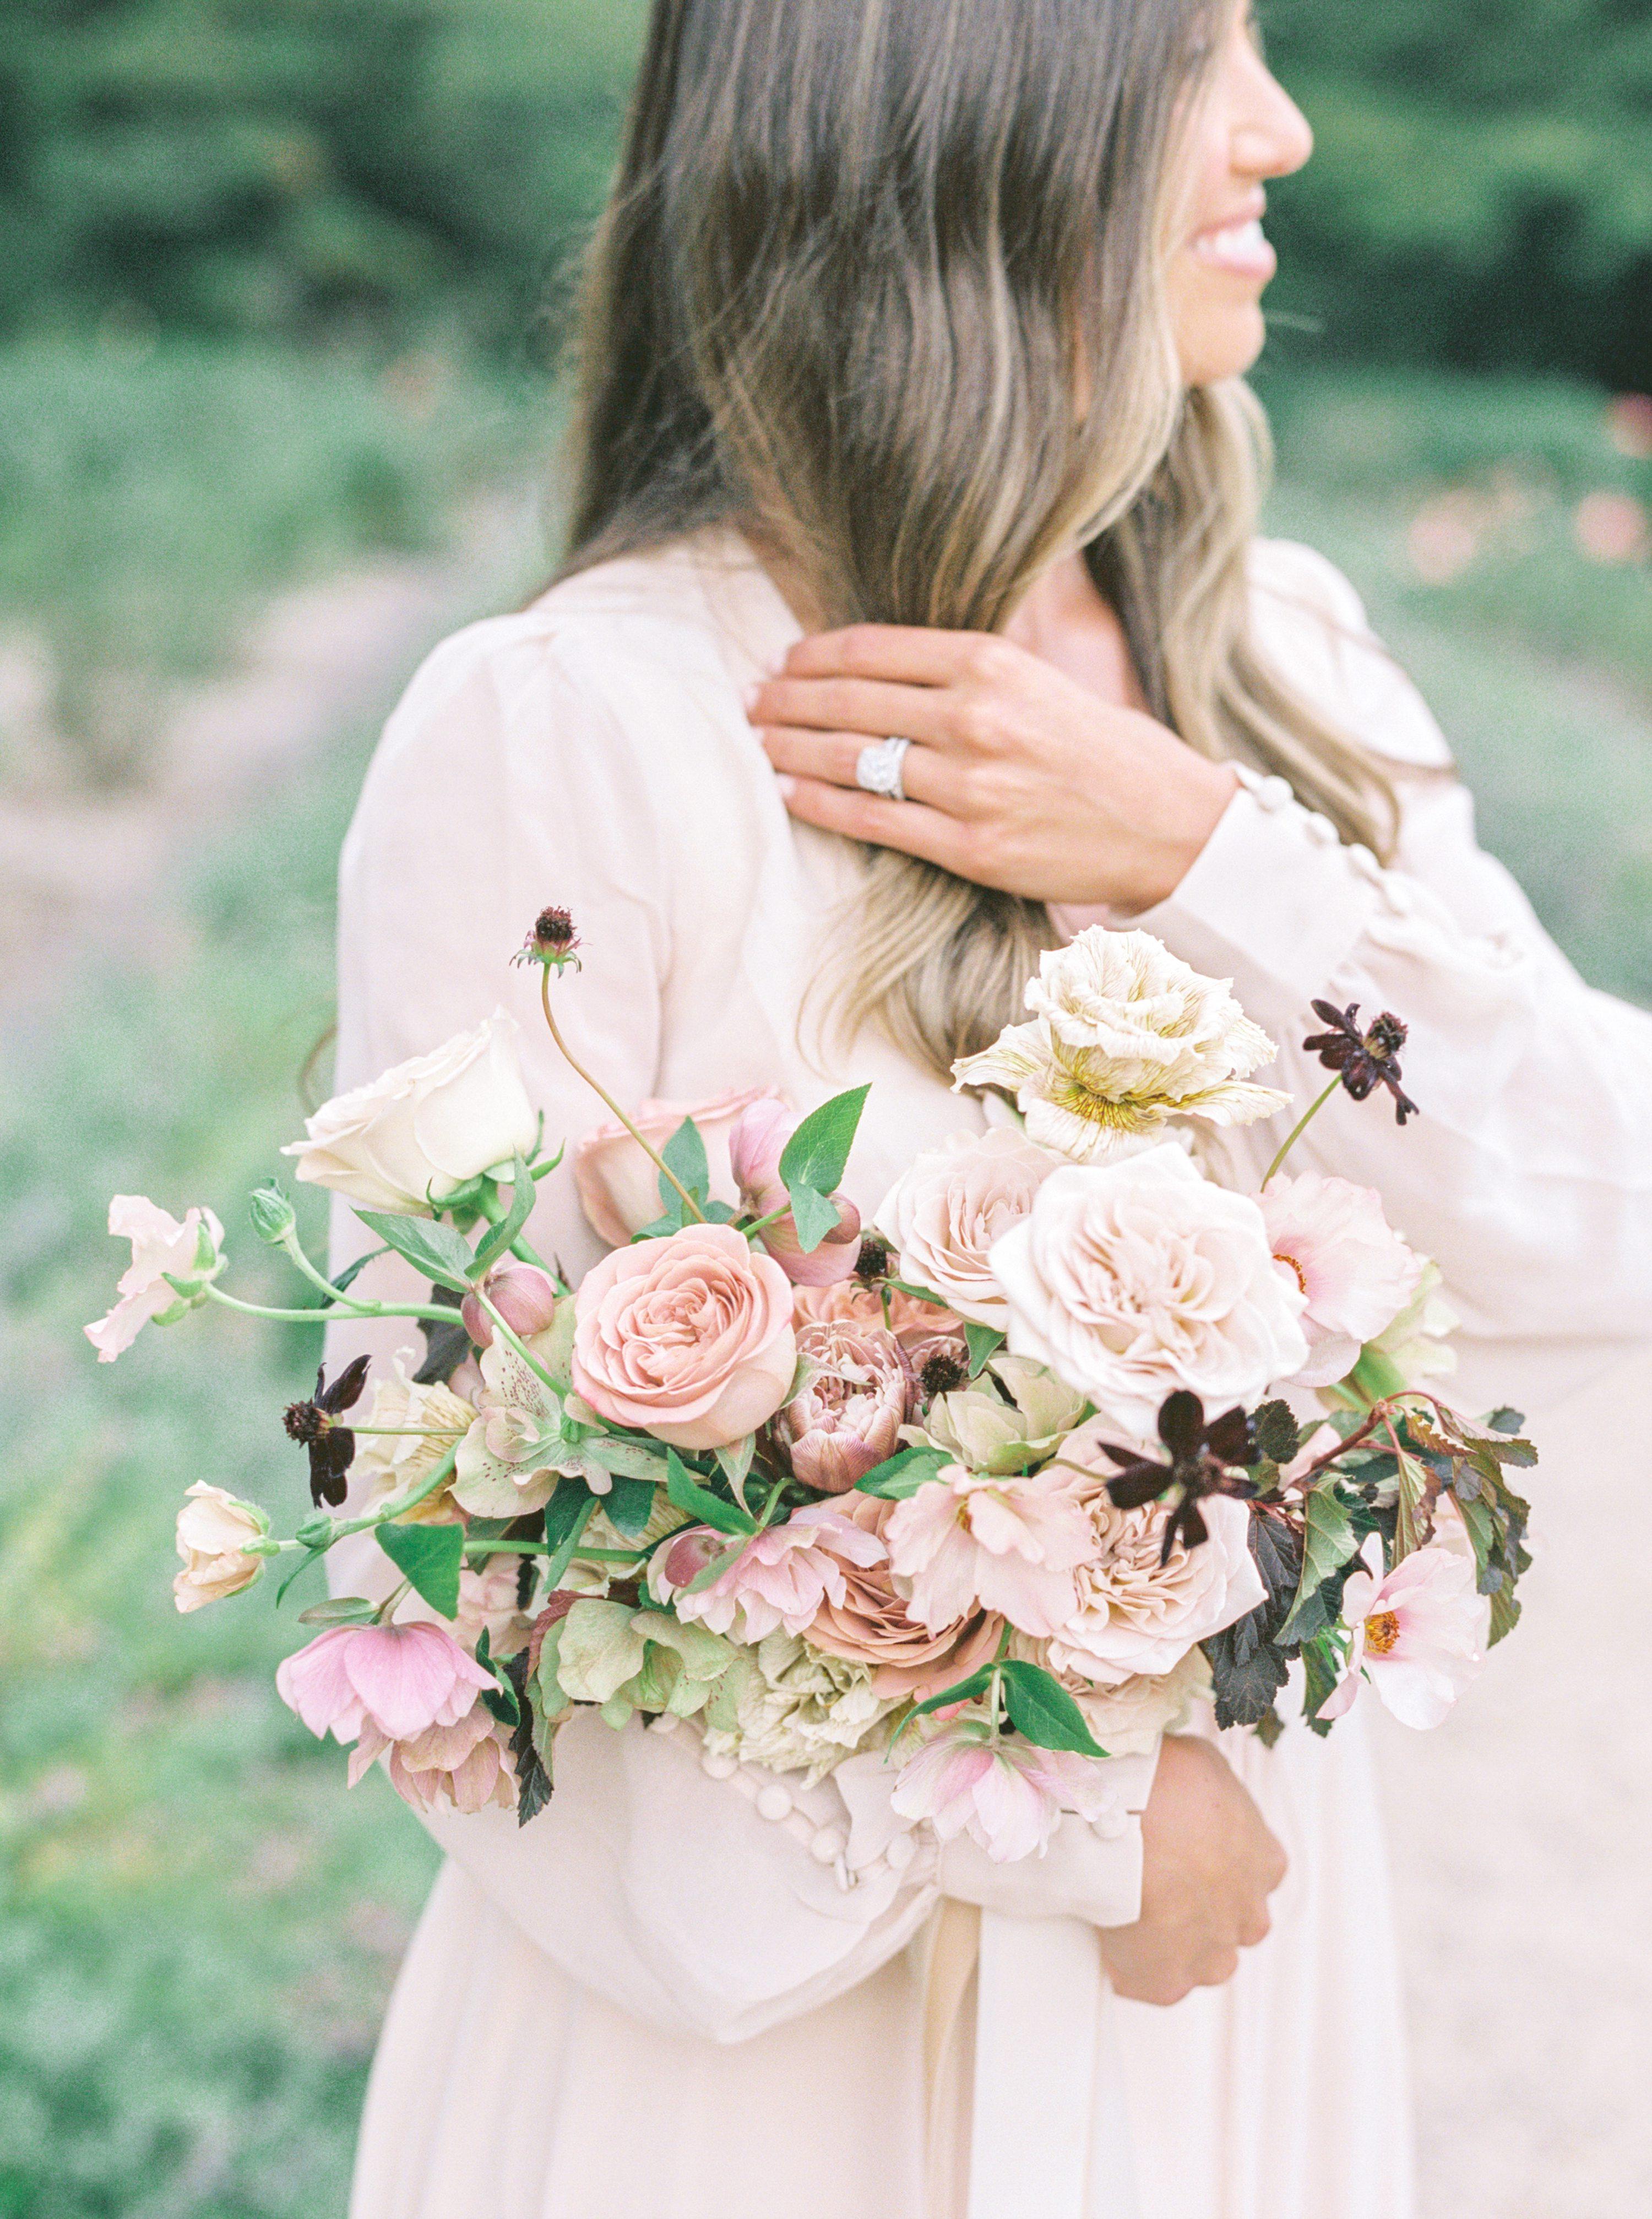 PLanting Fields Arboretum Engagement Photos,New York Wedding Photographer